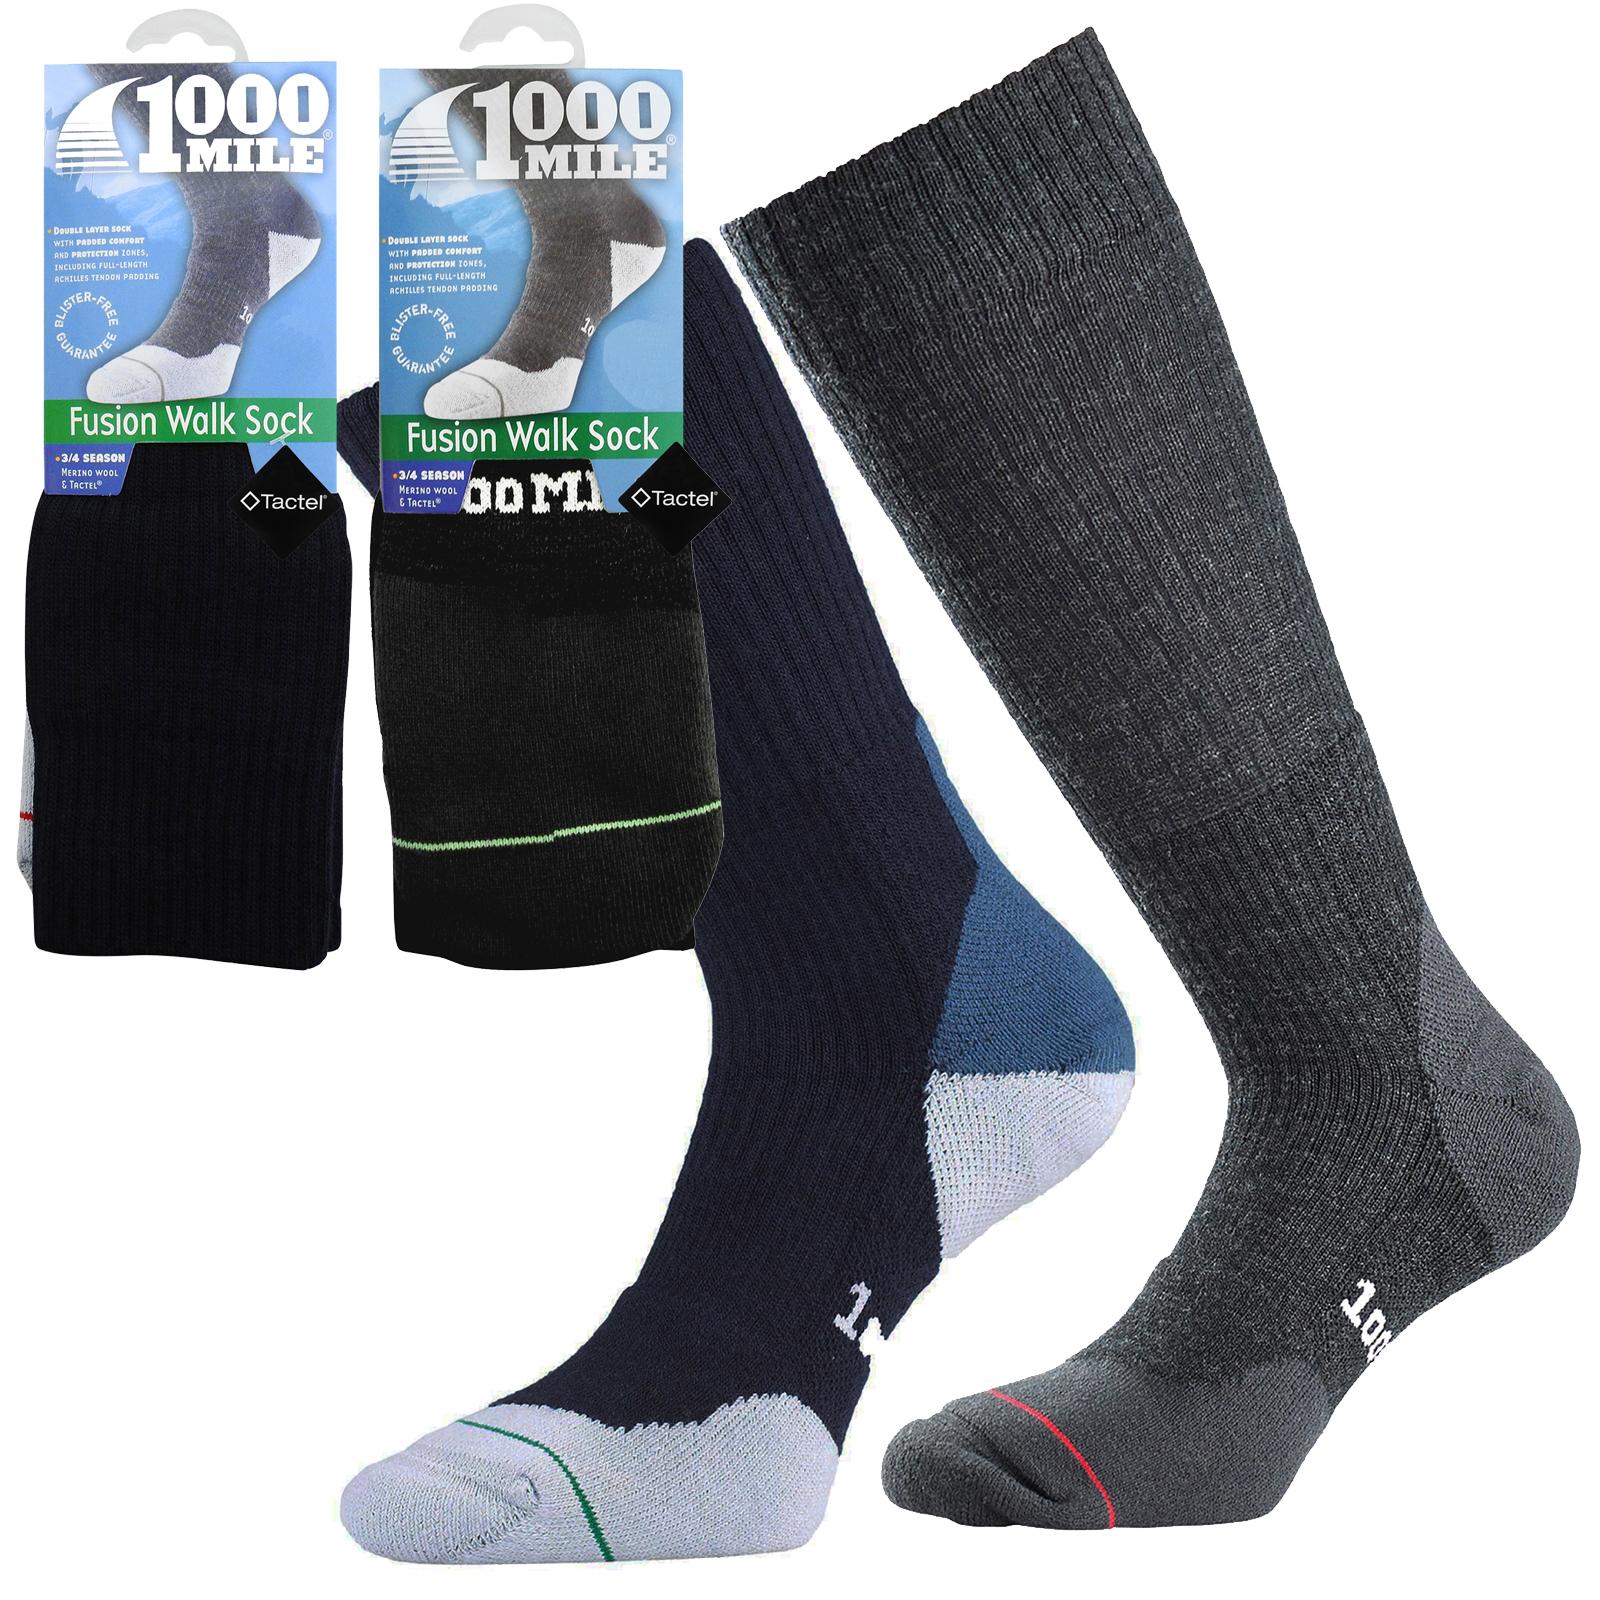 1000 Mile Mens Fusion Merino Walking Sock